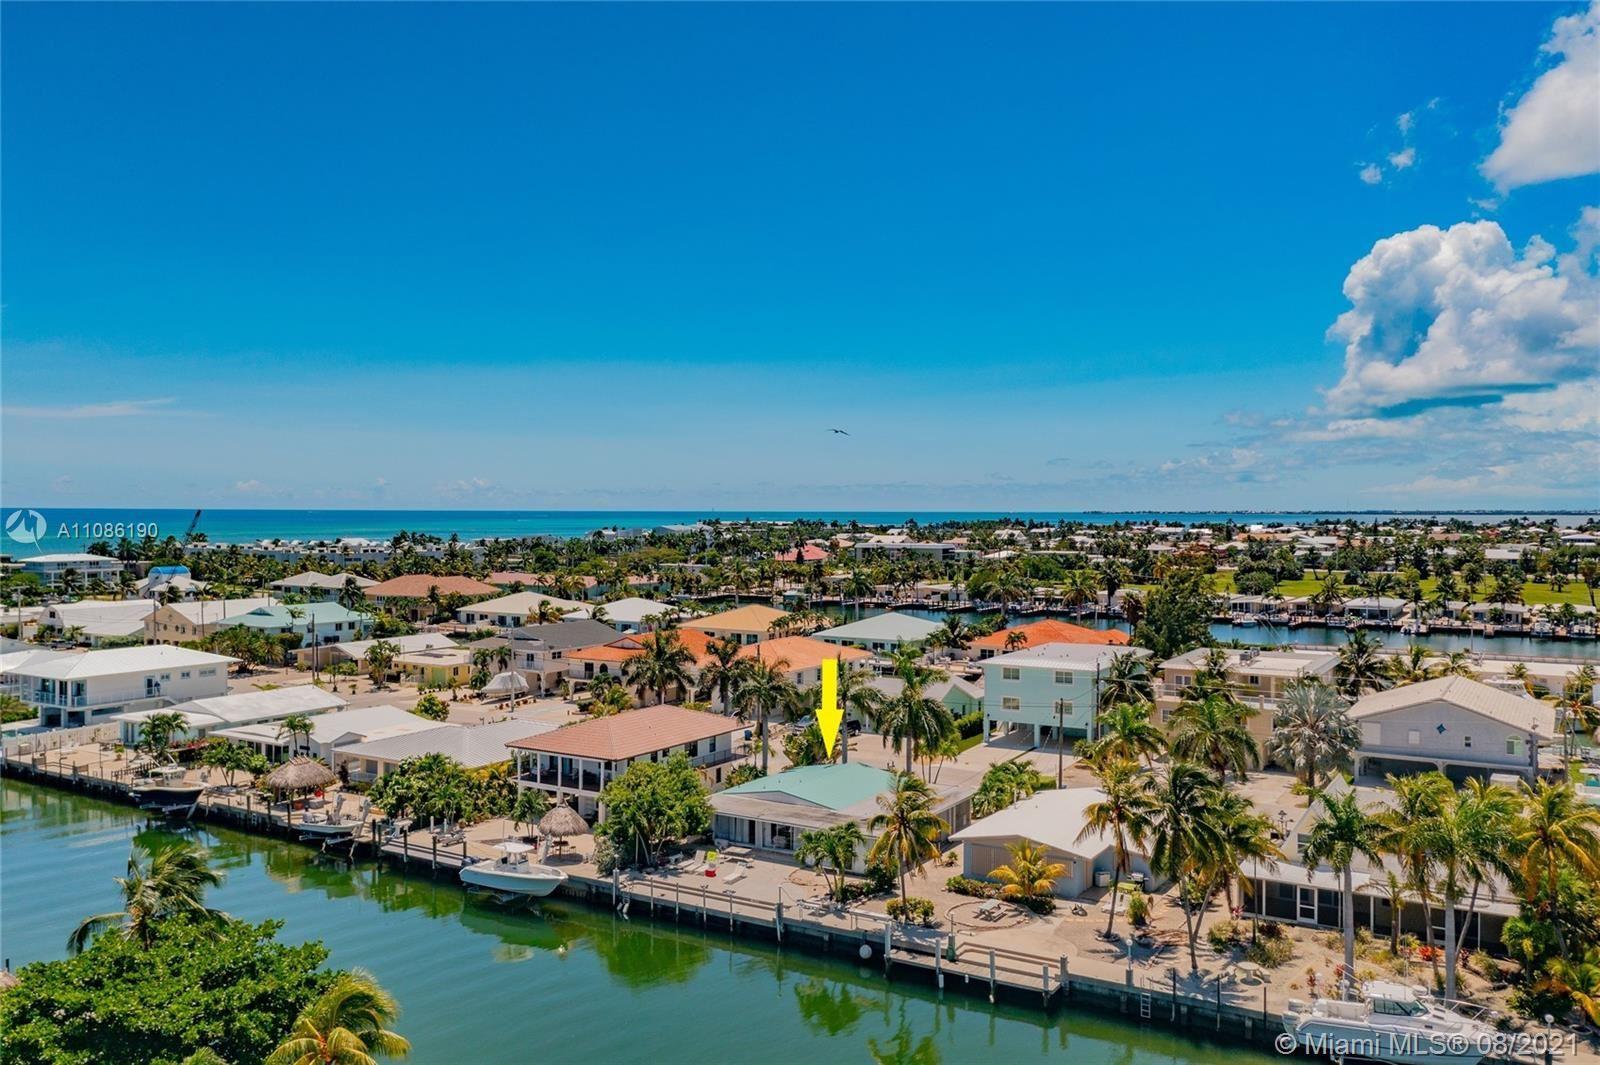 440 5th St, Key Colony Beach, FL 33051 - #: A11086190